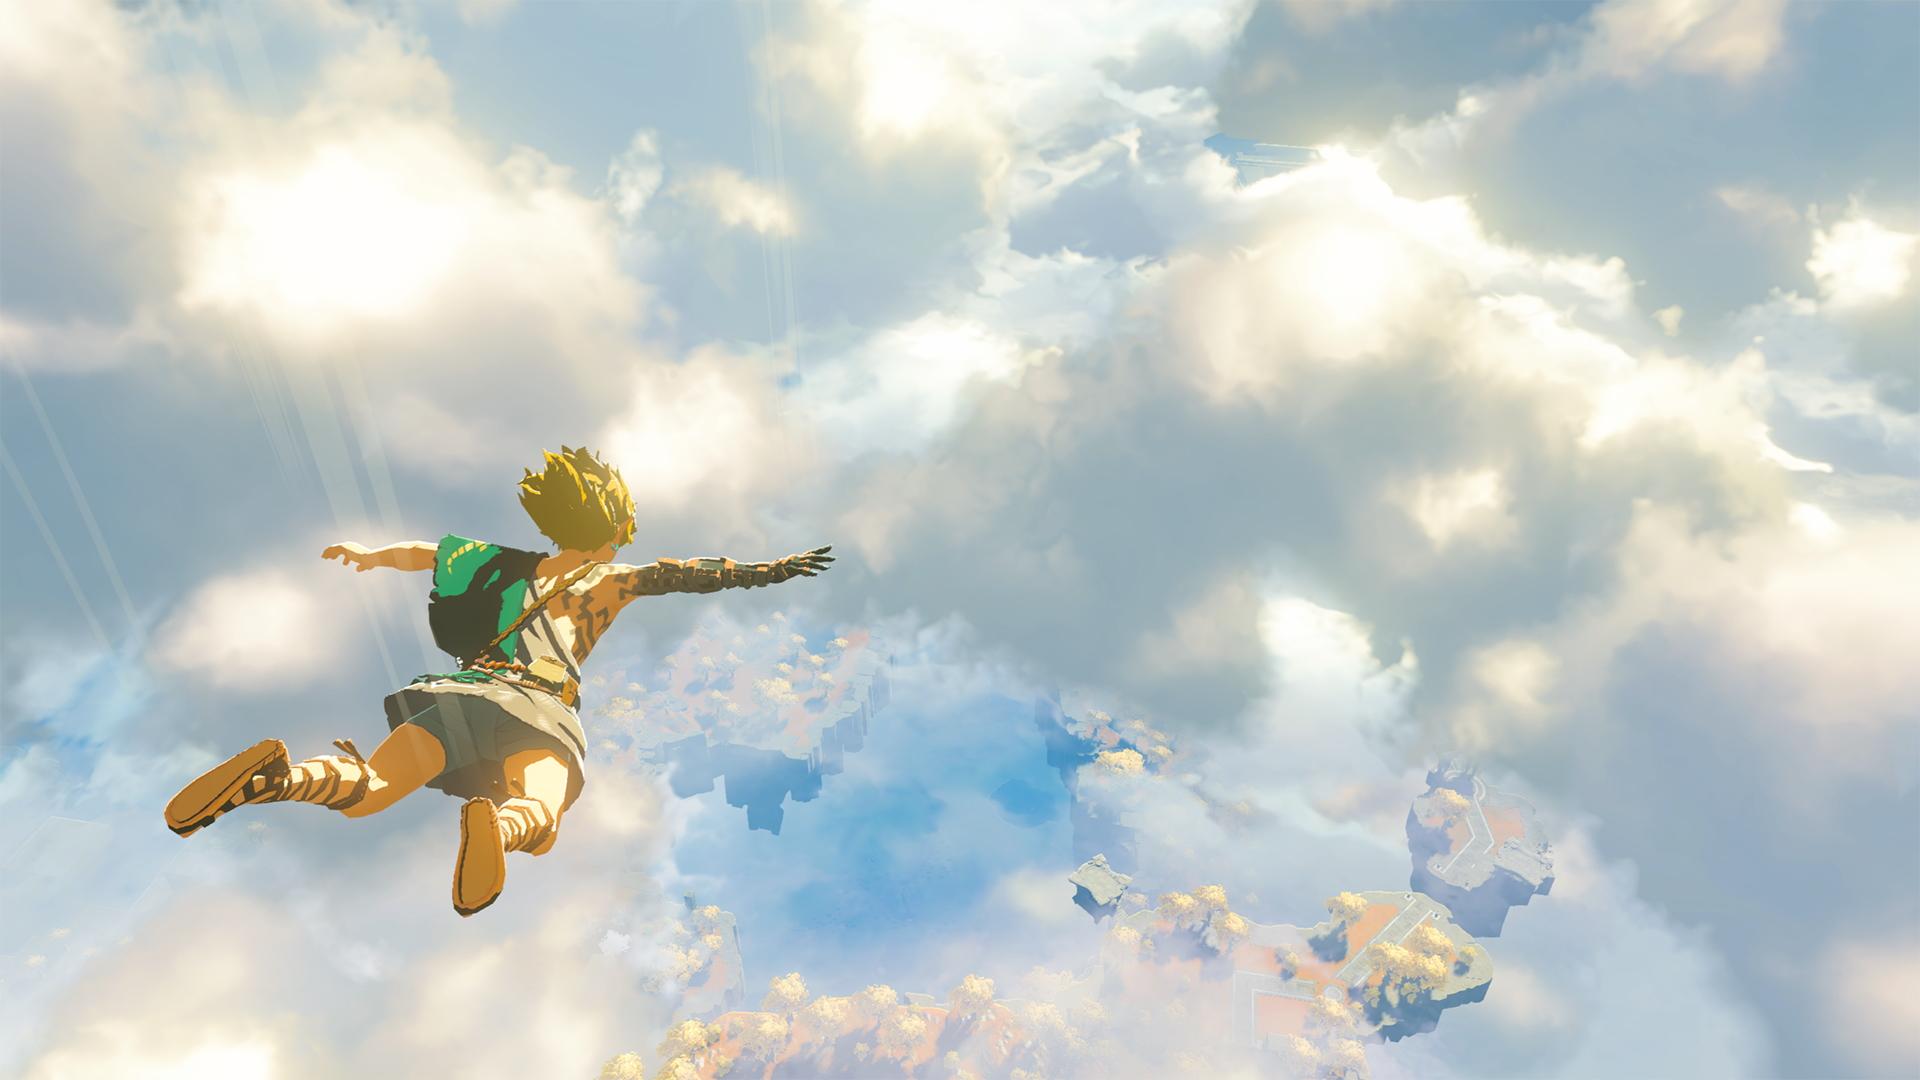 breath of the wild sequel sky